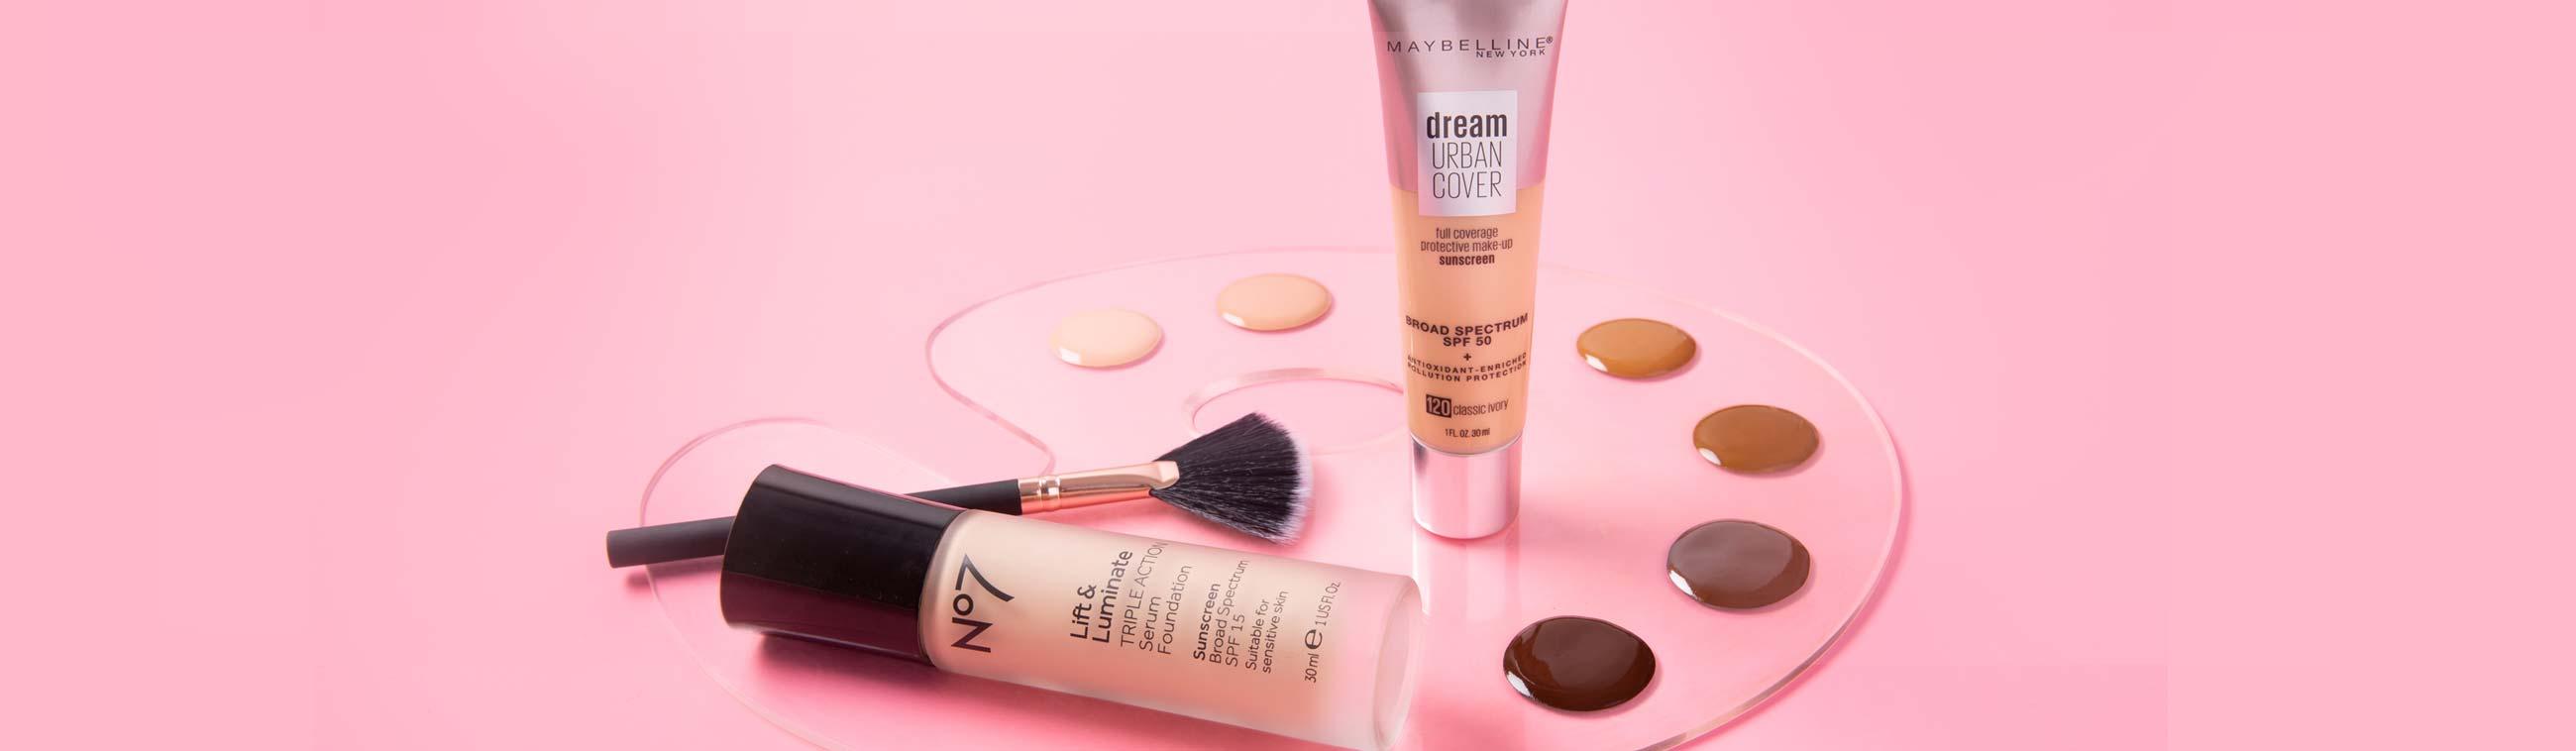 Cosmetics | Walgreens